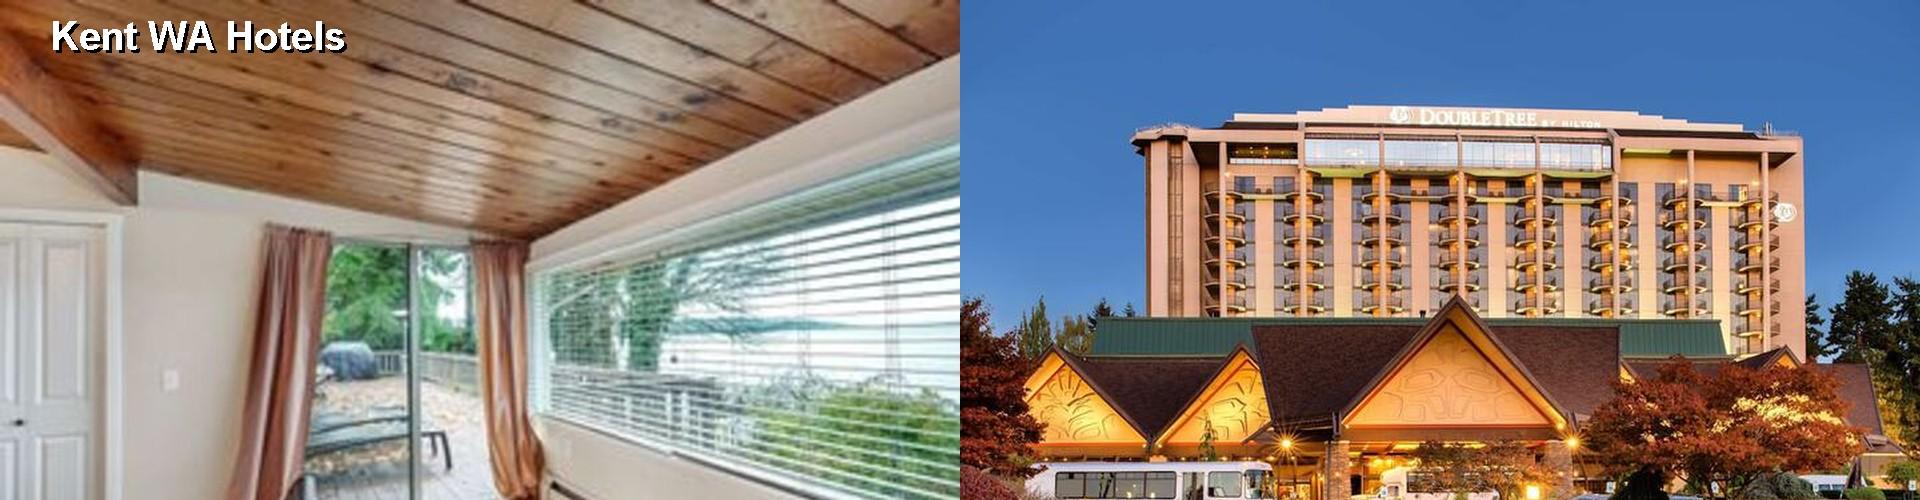 5 Best Hotels Near Kent Wa